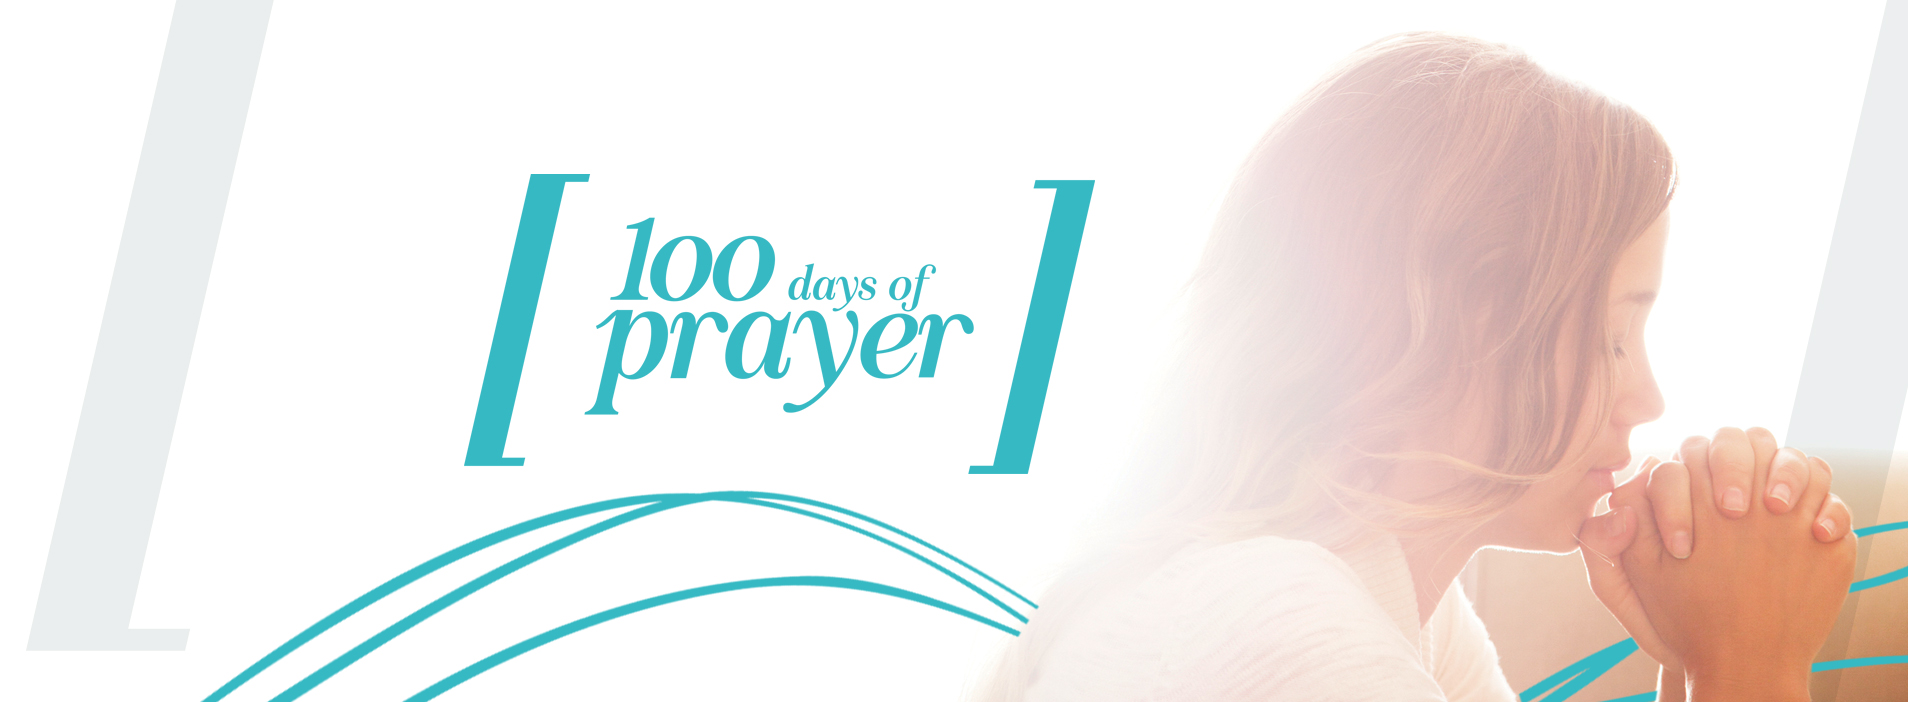 site_capa_100_days_prayer